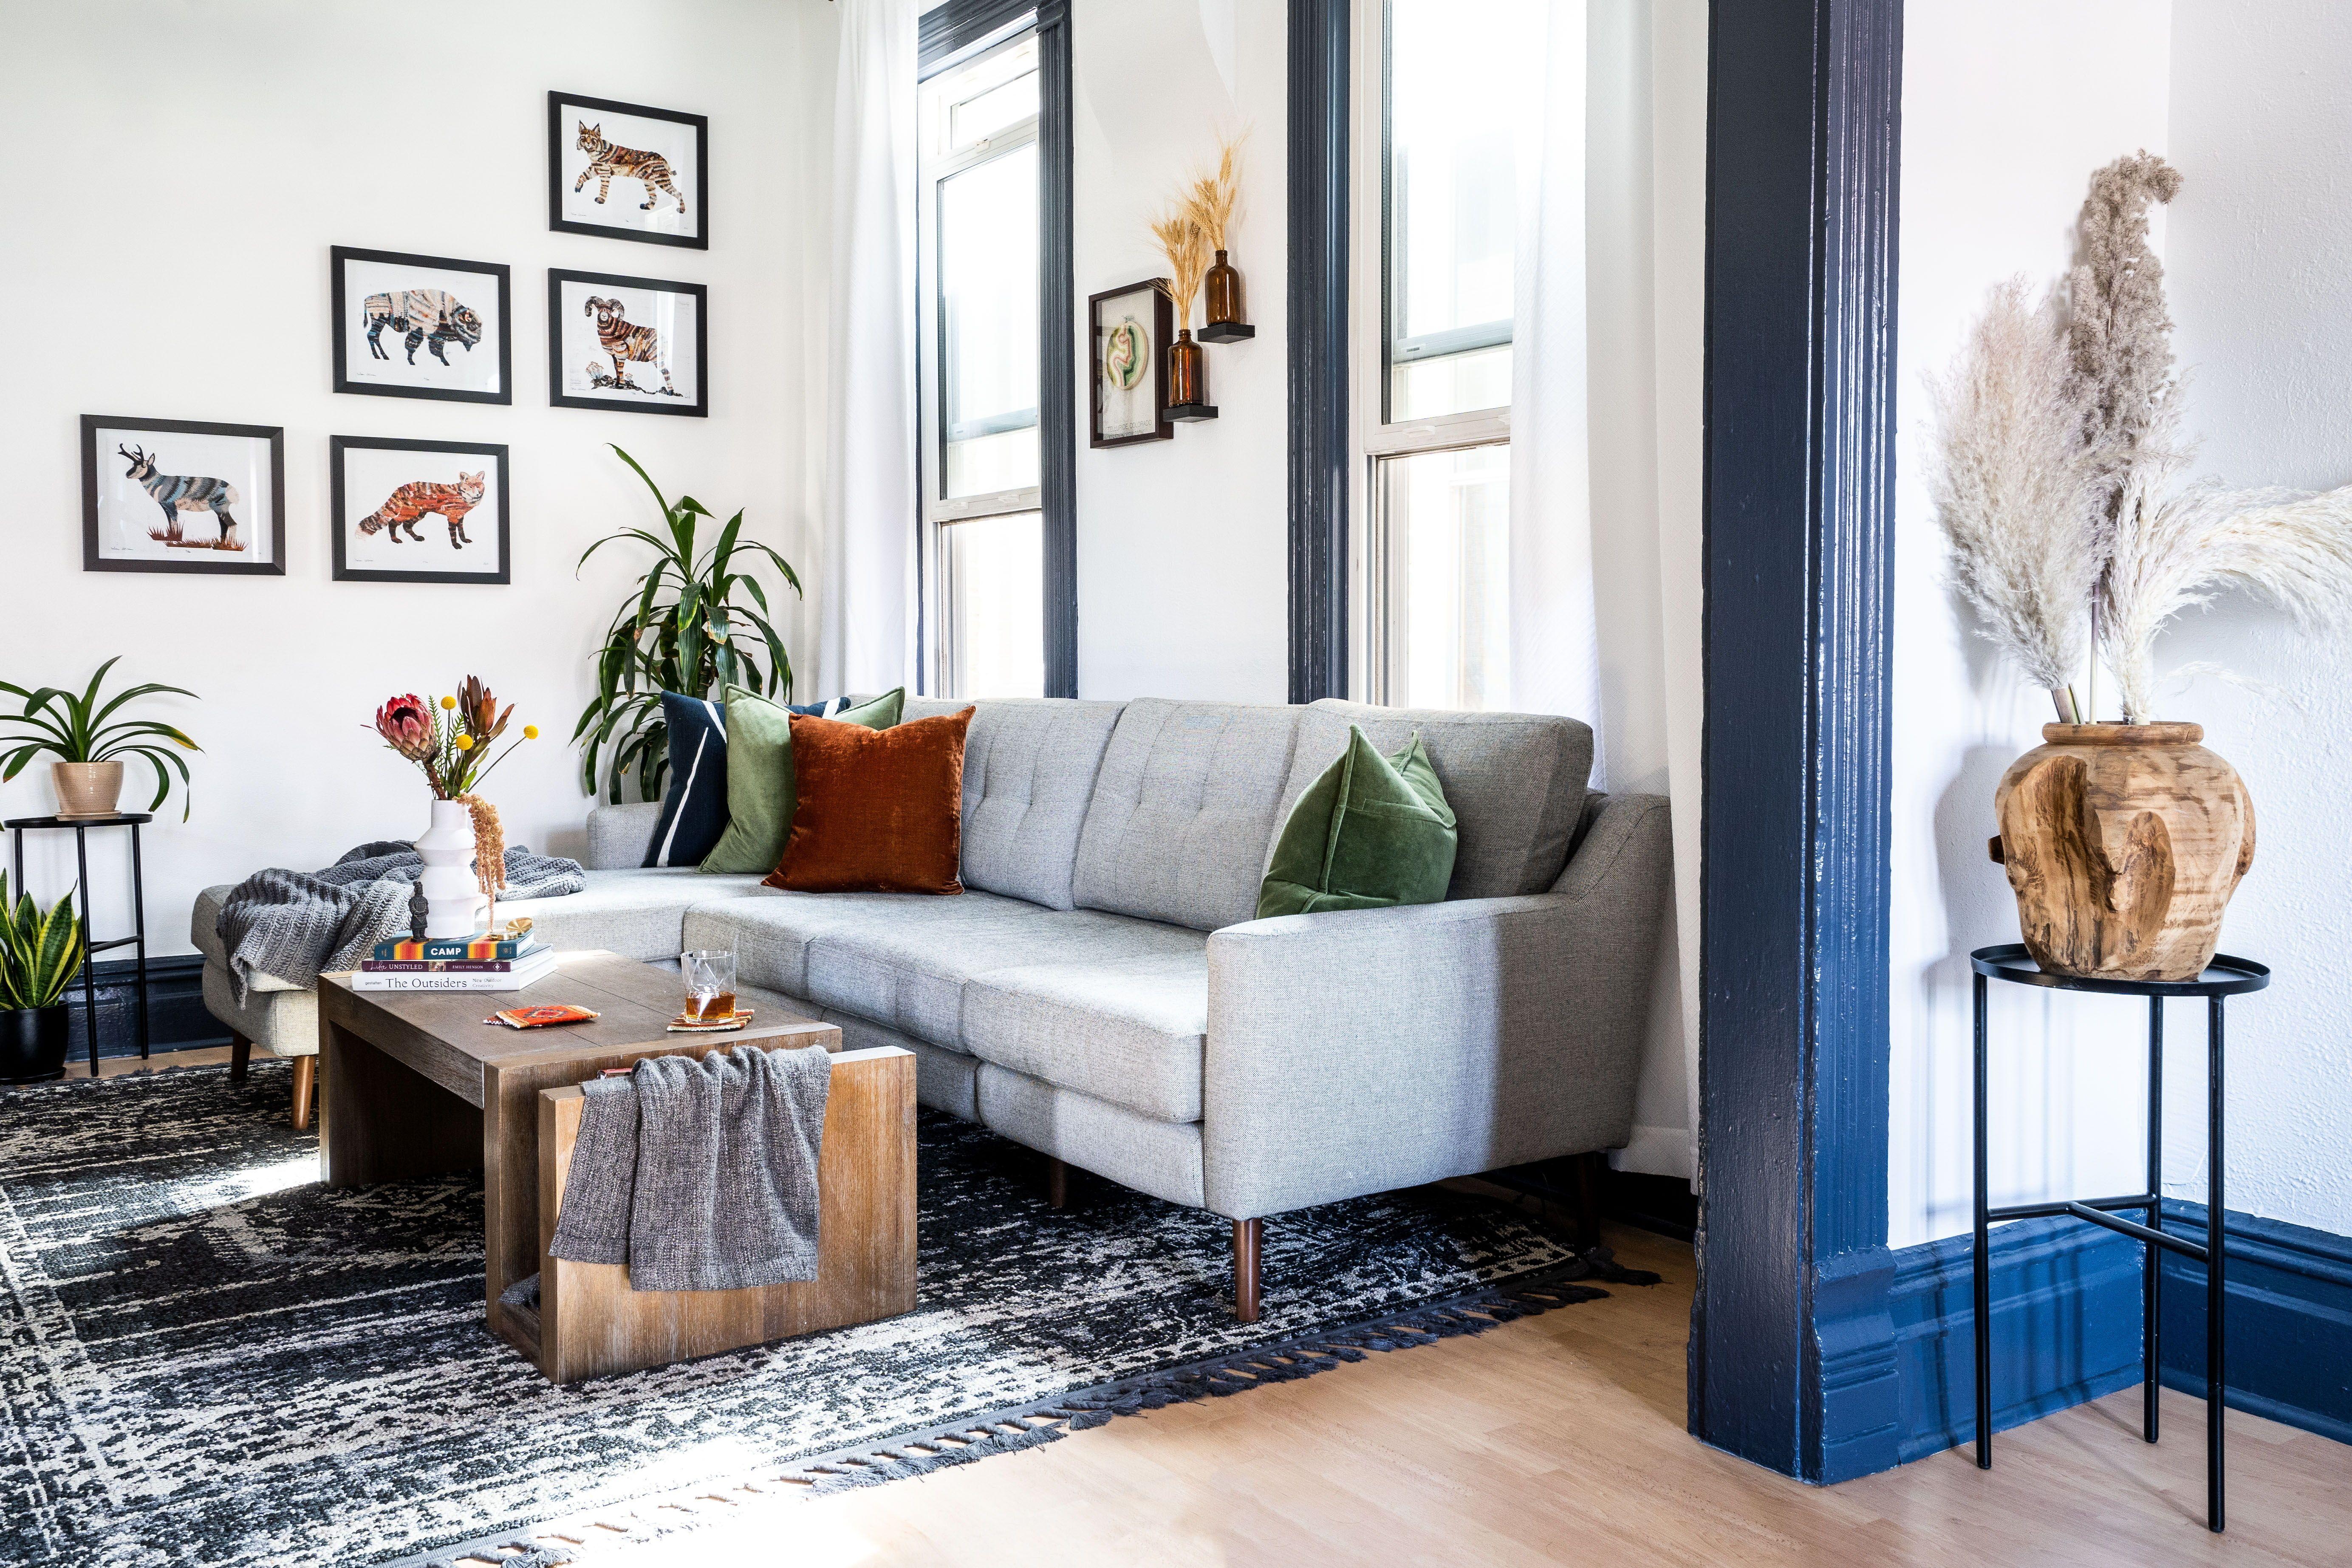 25 Living Room Interior Design Ideas Havenly In 2021 Livingroom Layout Small Living Room Layout Perfect Living Room